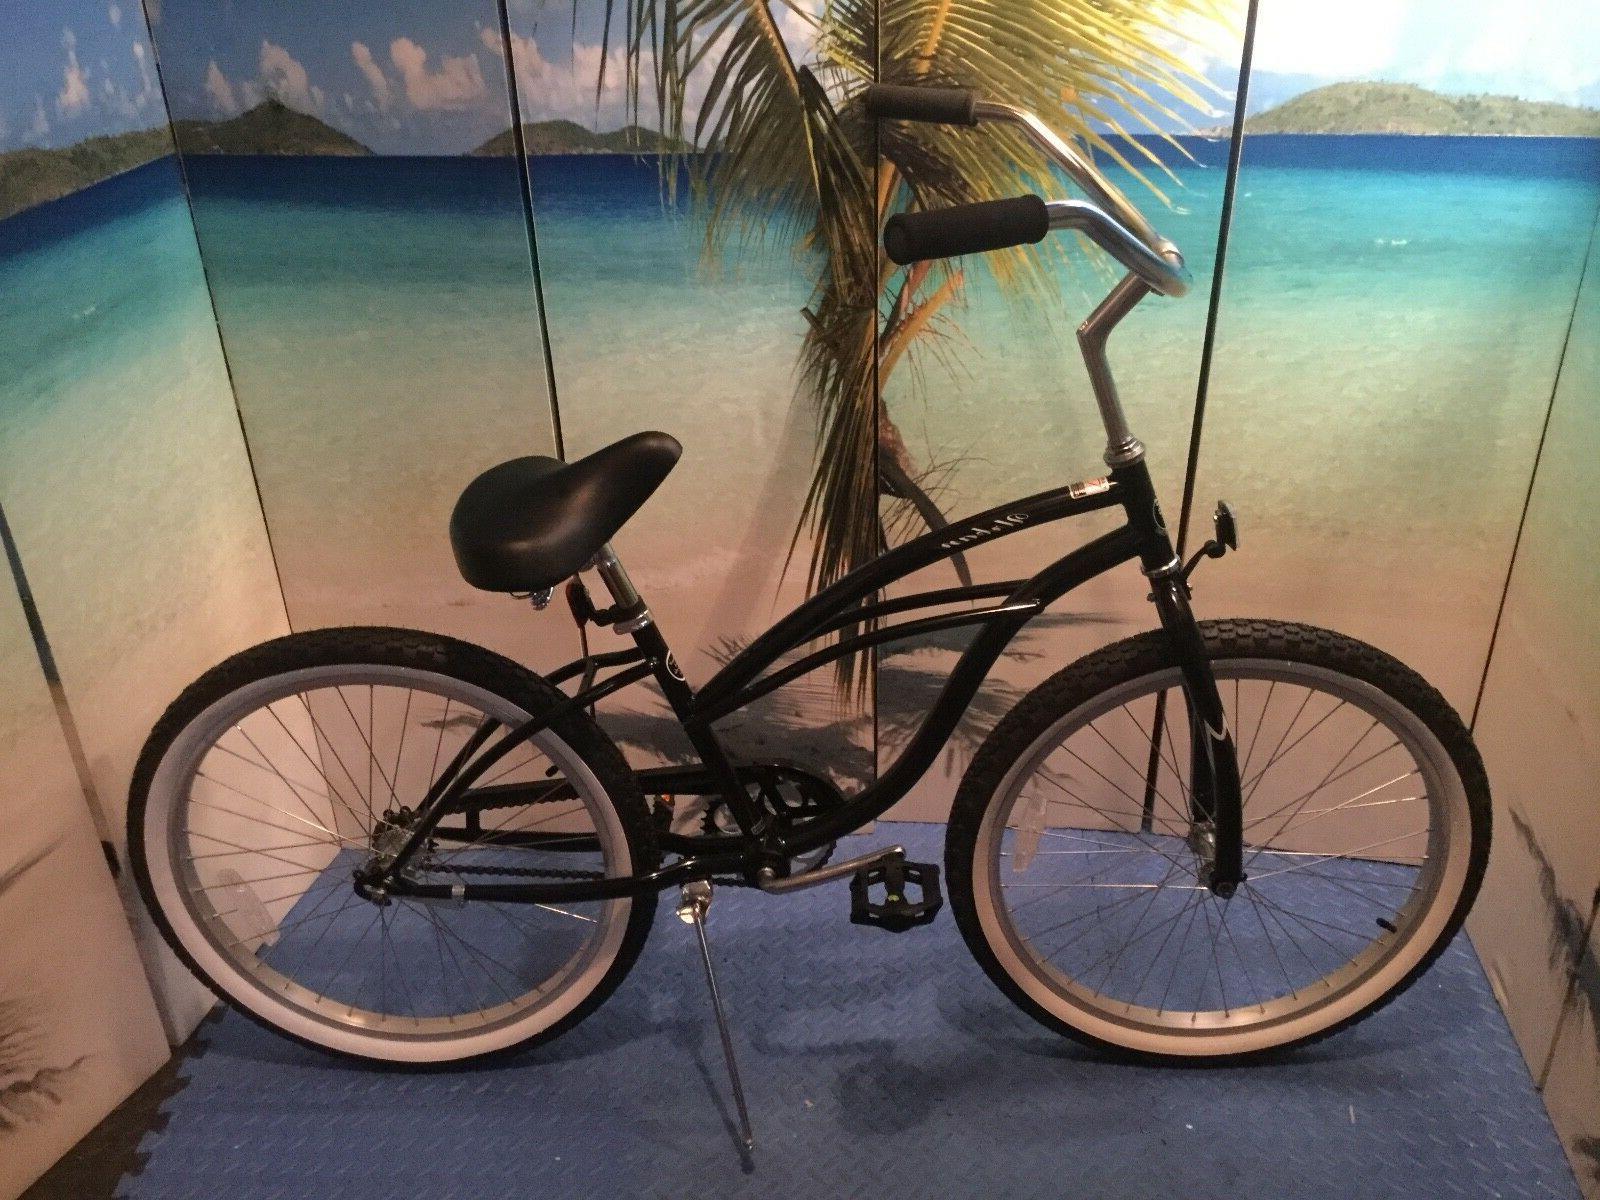 Firmstrong Urban Man Speed Cruiser Bicycle, 24-Inch,